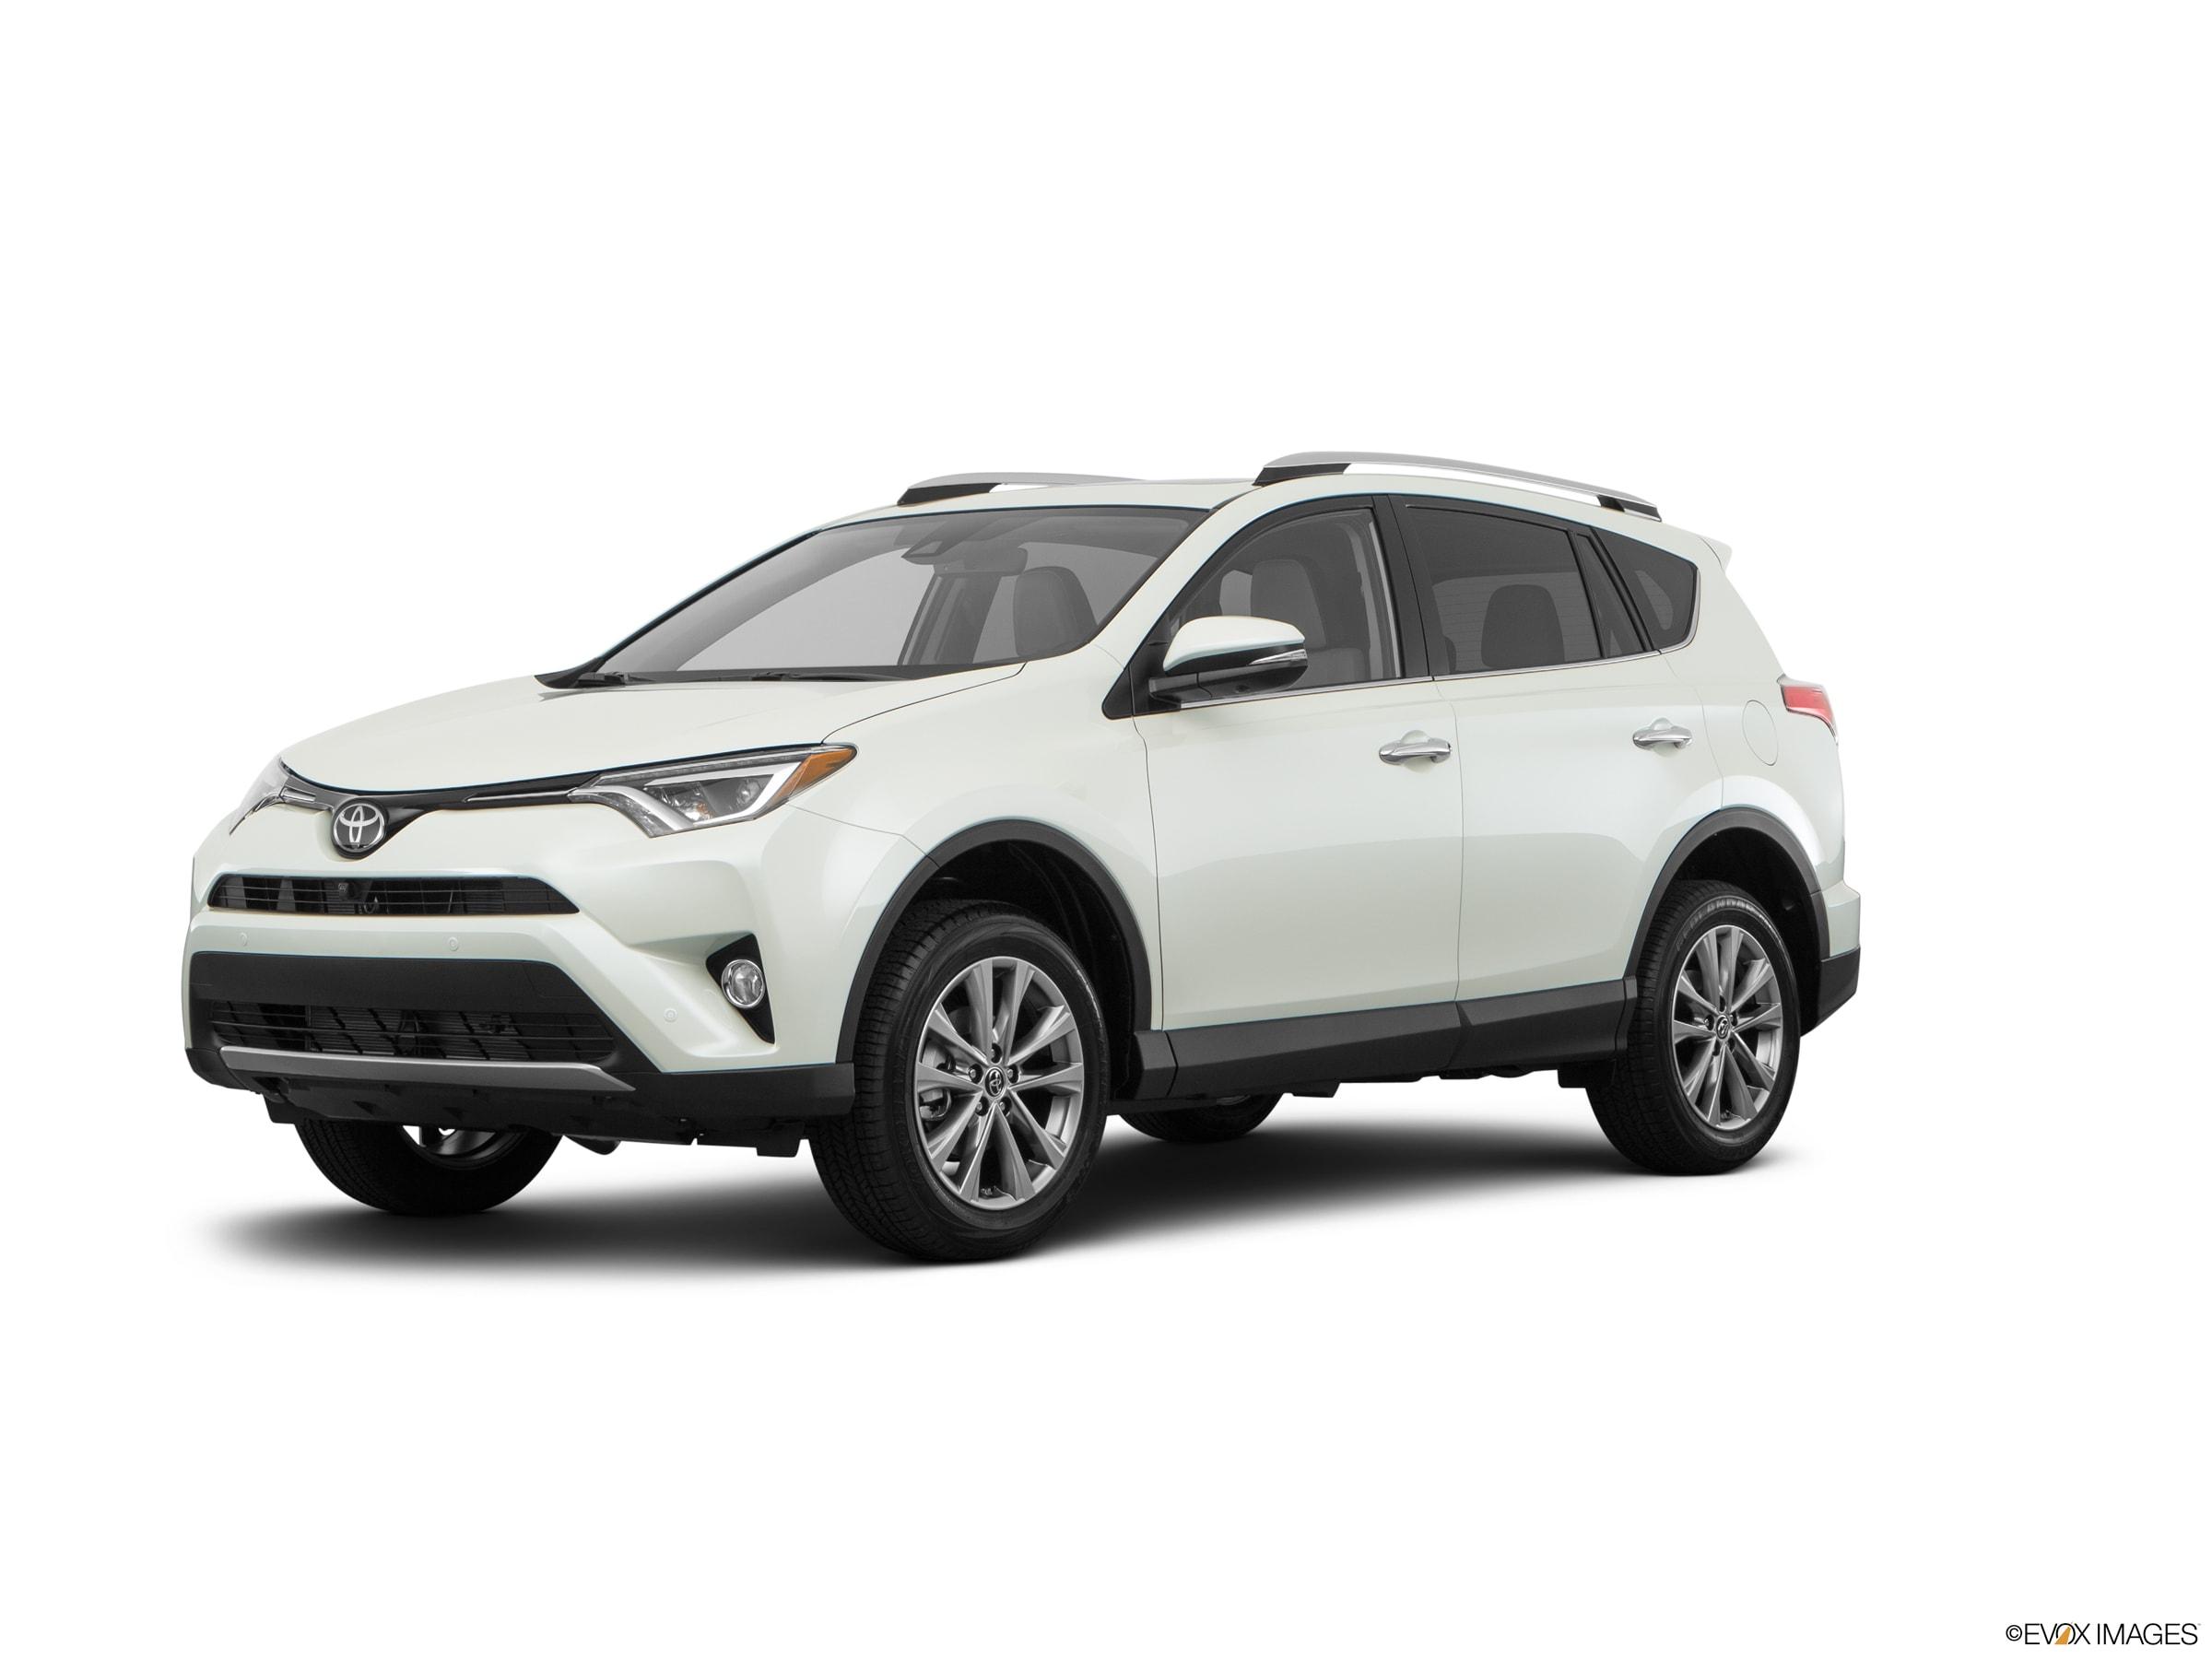 Certified 2018 Toyota RAV4 Limited with VIN JTMDFREV4JJ253617 for sale in Maplewood, Minnesota